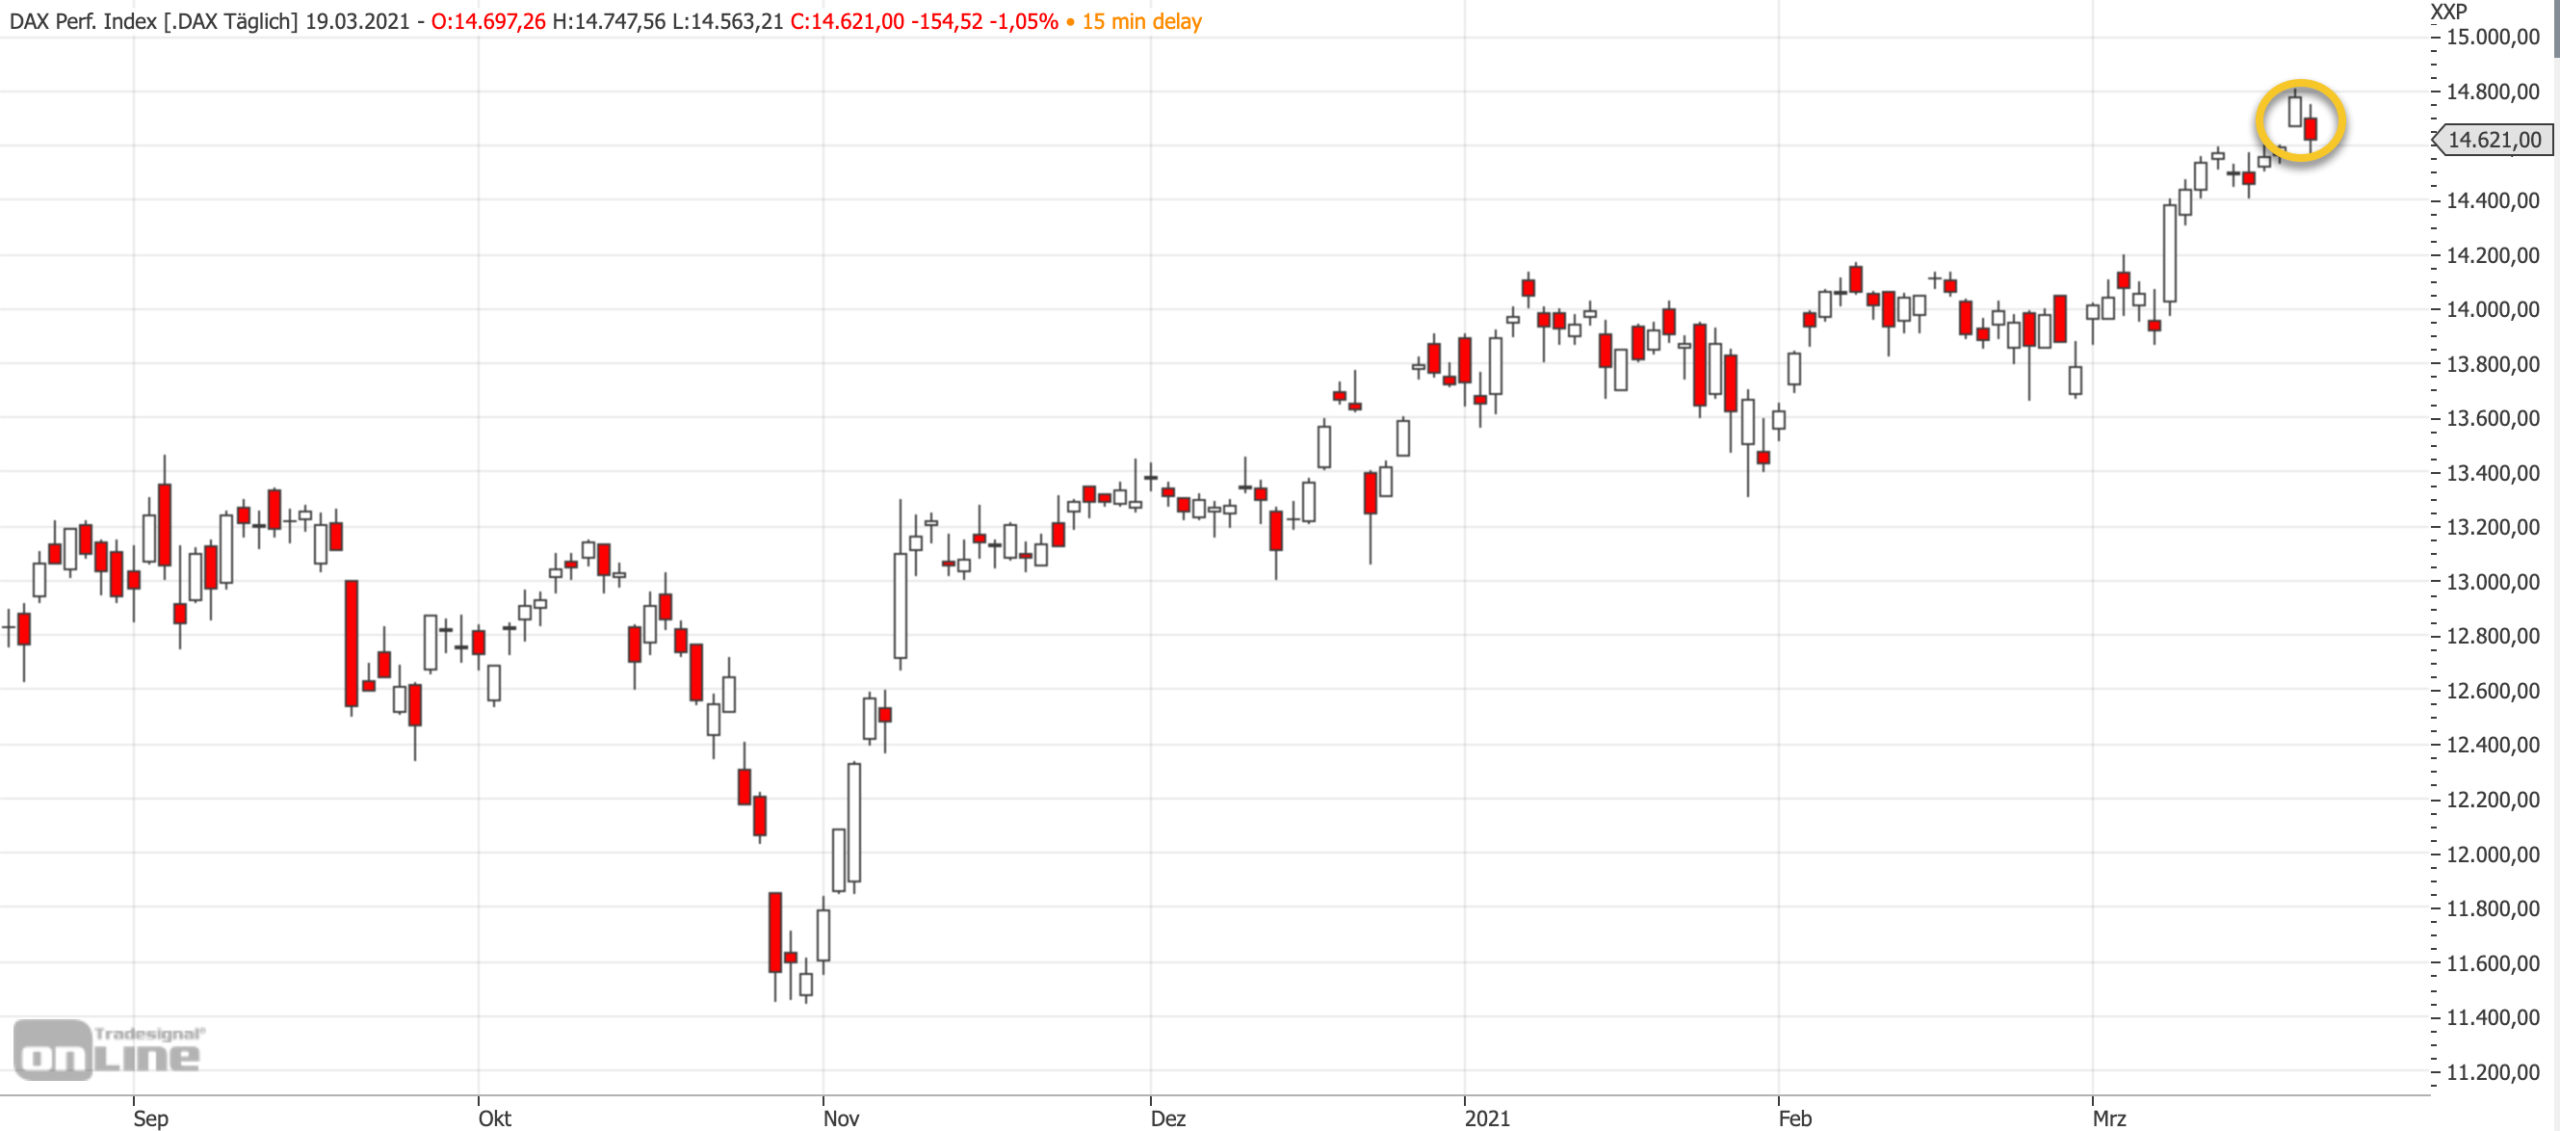 Mittelfristiger DAX-Chart am 19.03.2021